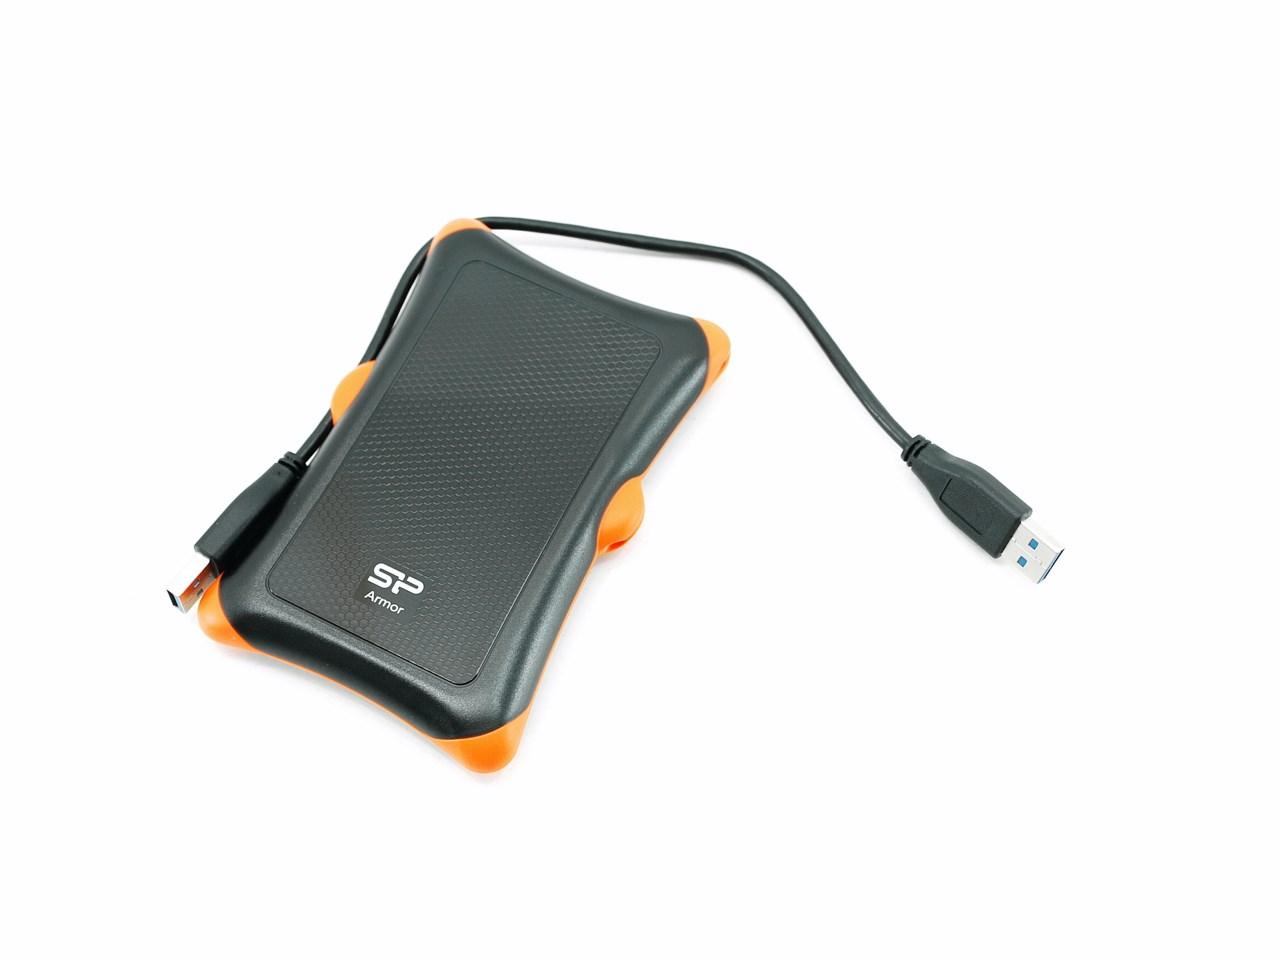 seagate external hard drive 1tb manual